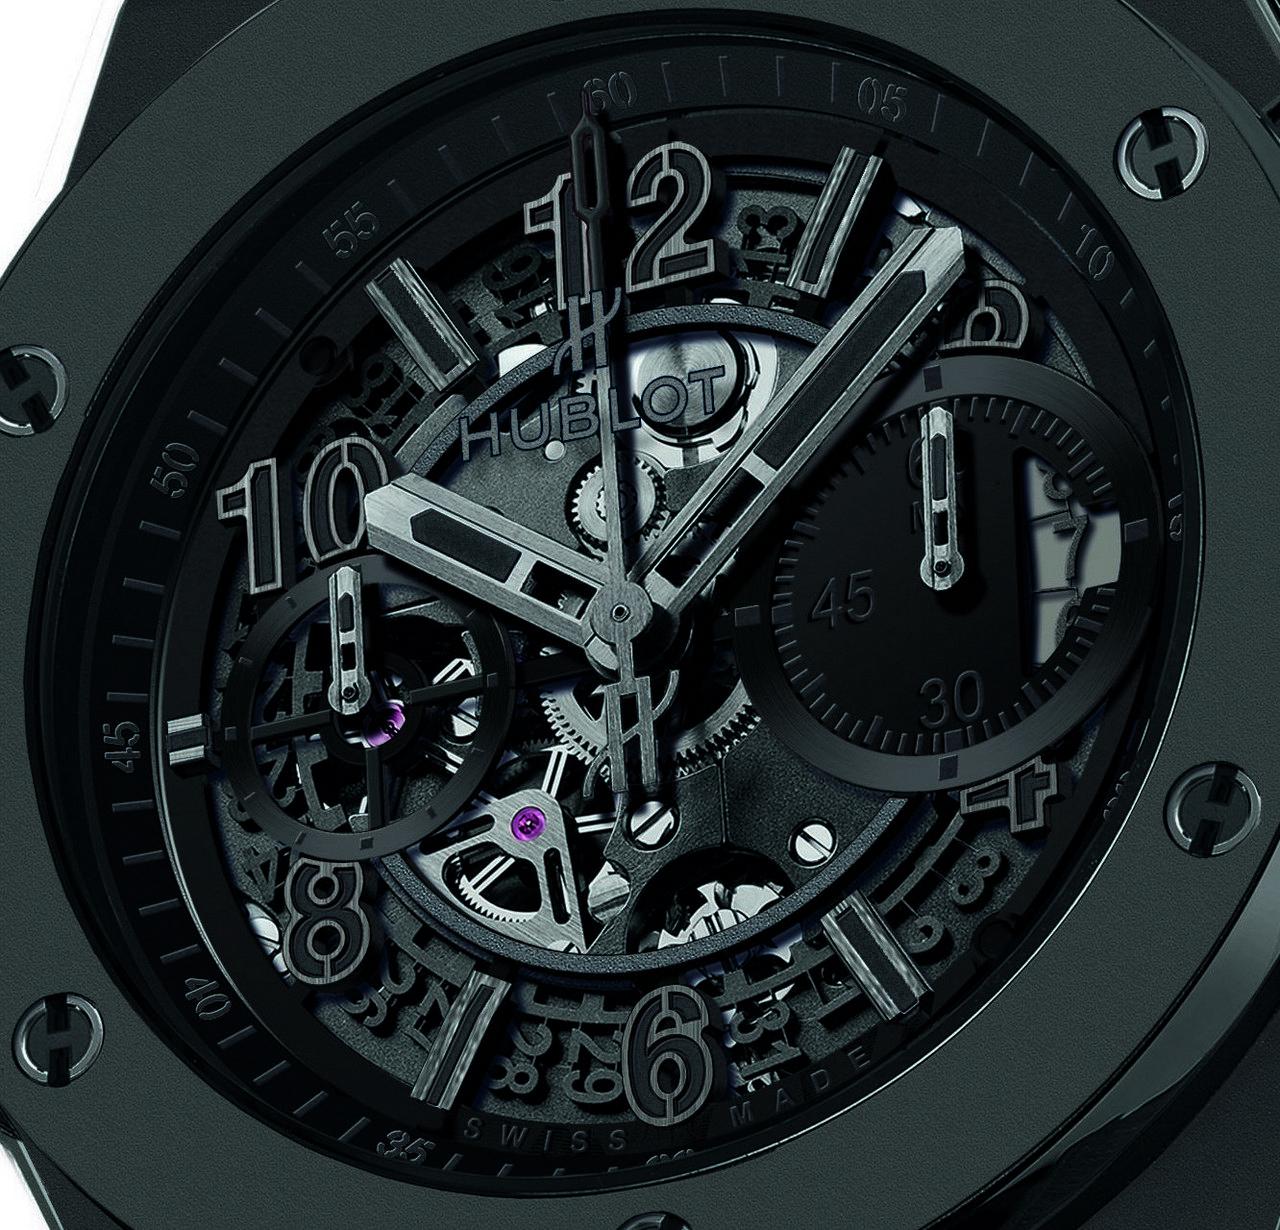 sihh-2014-hublot-big-bang-unico-all-black-limited-edition_0-100_4